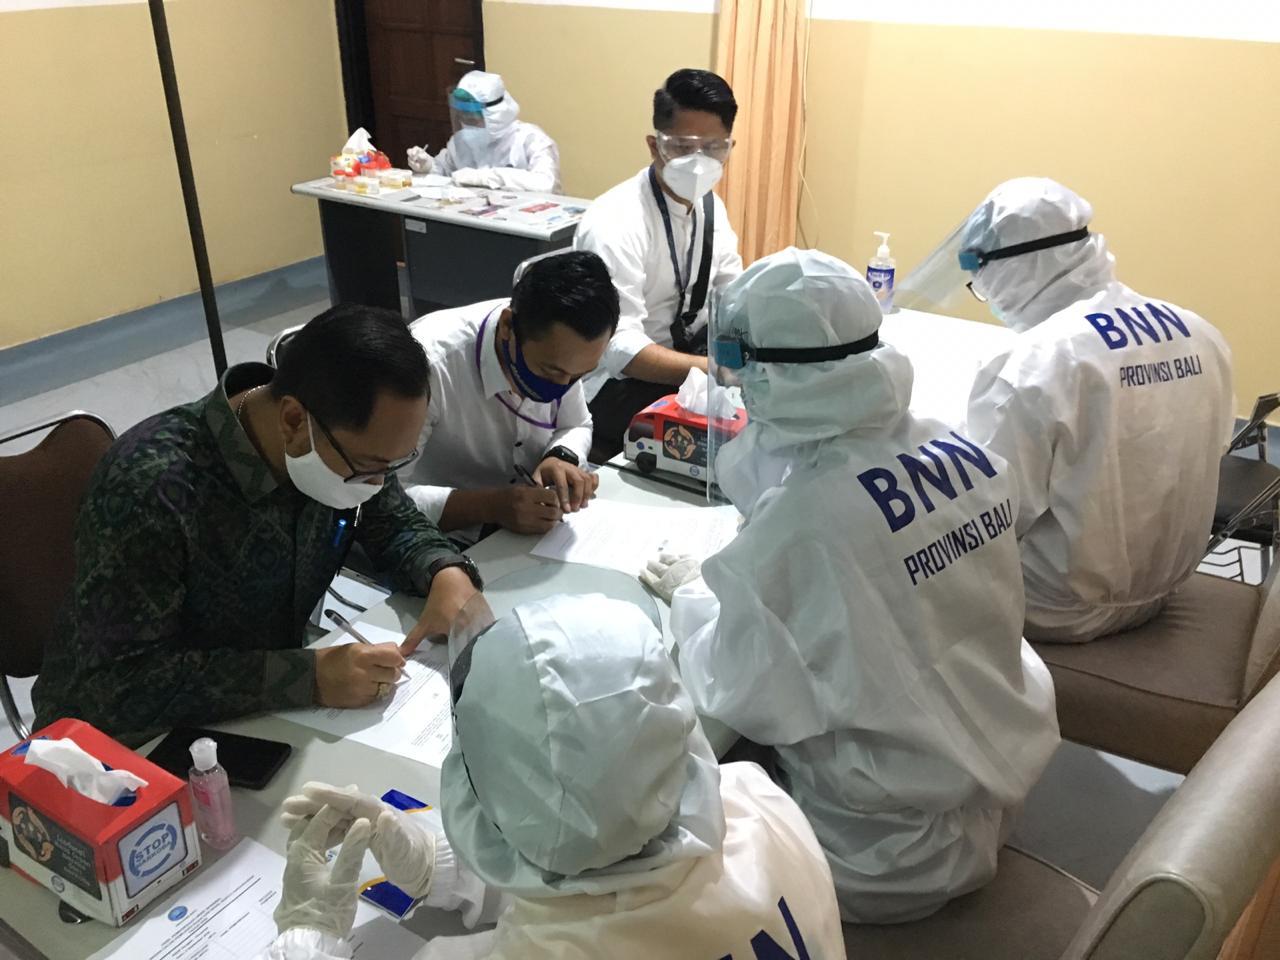 Pelaksanaan Pemeriksaan tes urine narkoba bagi para Calon Bupati dan Wakil Bupati Jemberana dan Karangasem